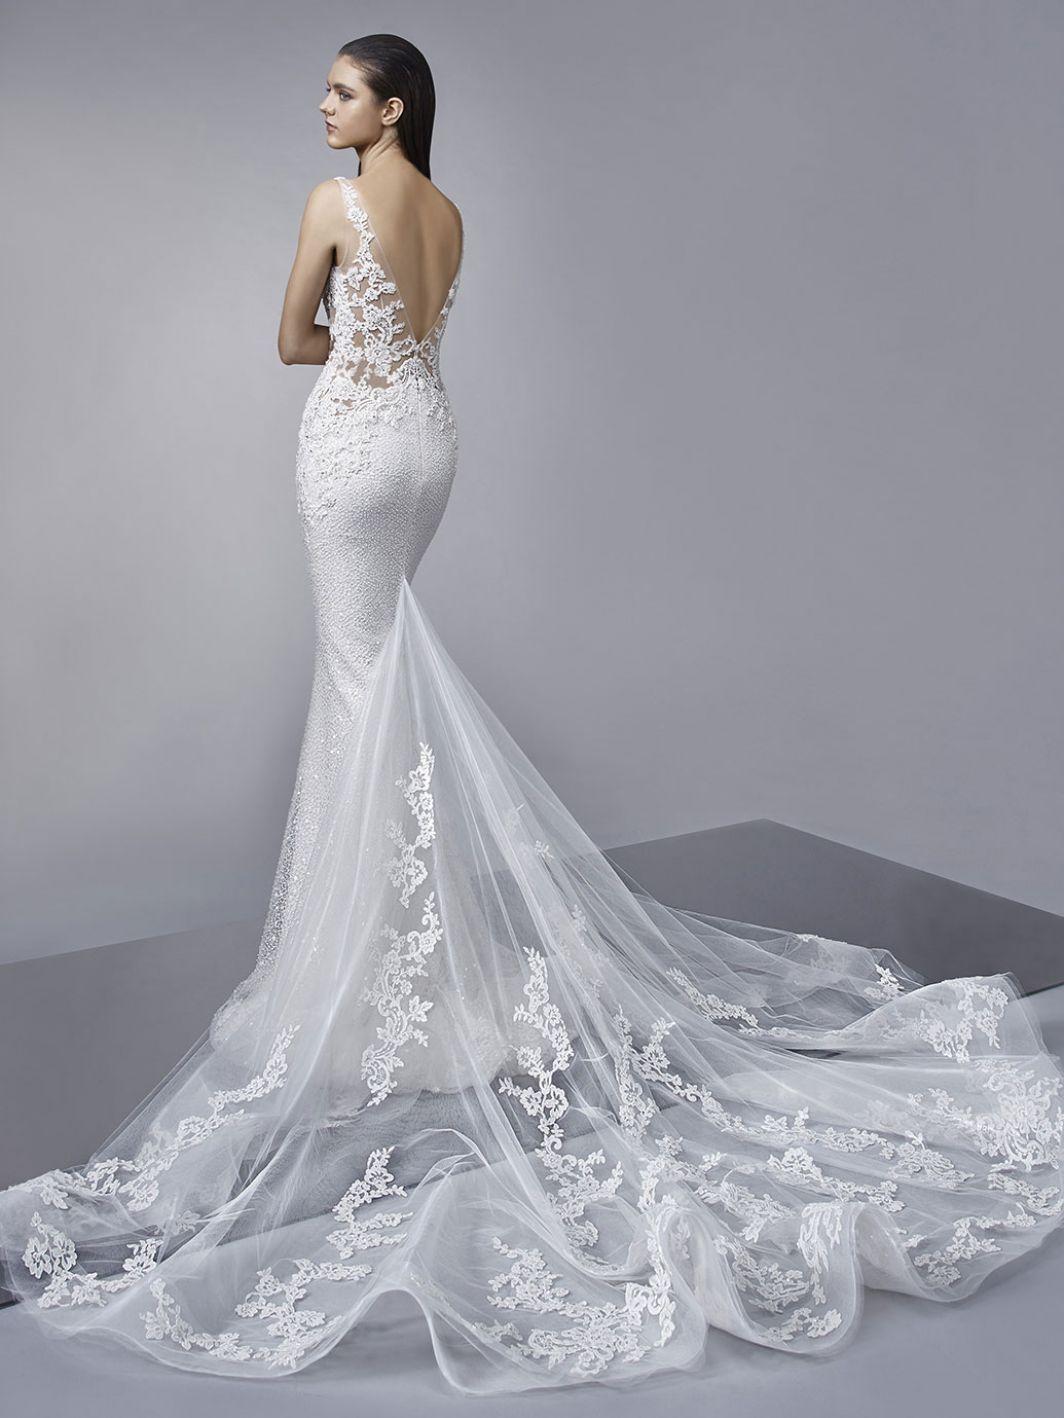 Pro miley wedding dress back by enzoni stardust celebrations dallas